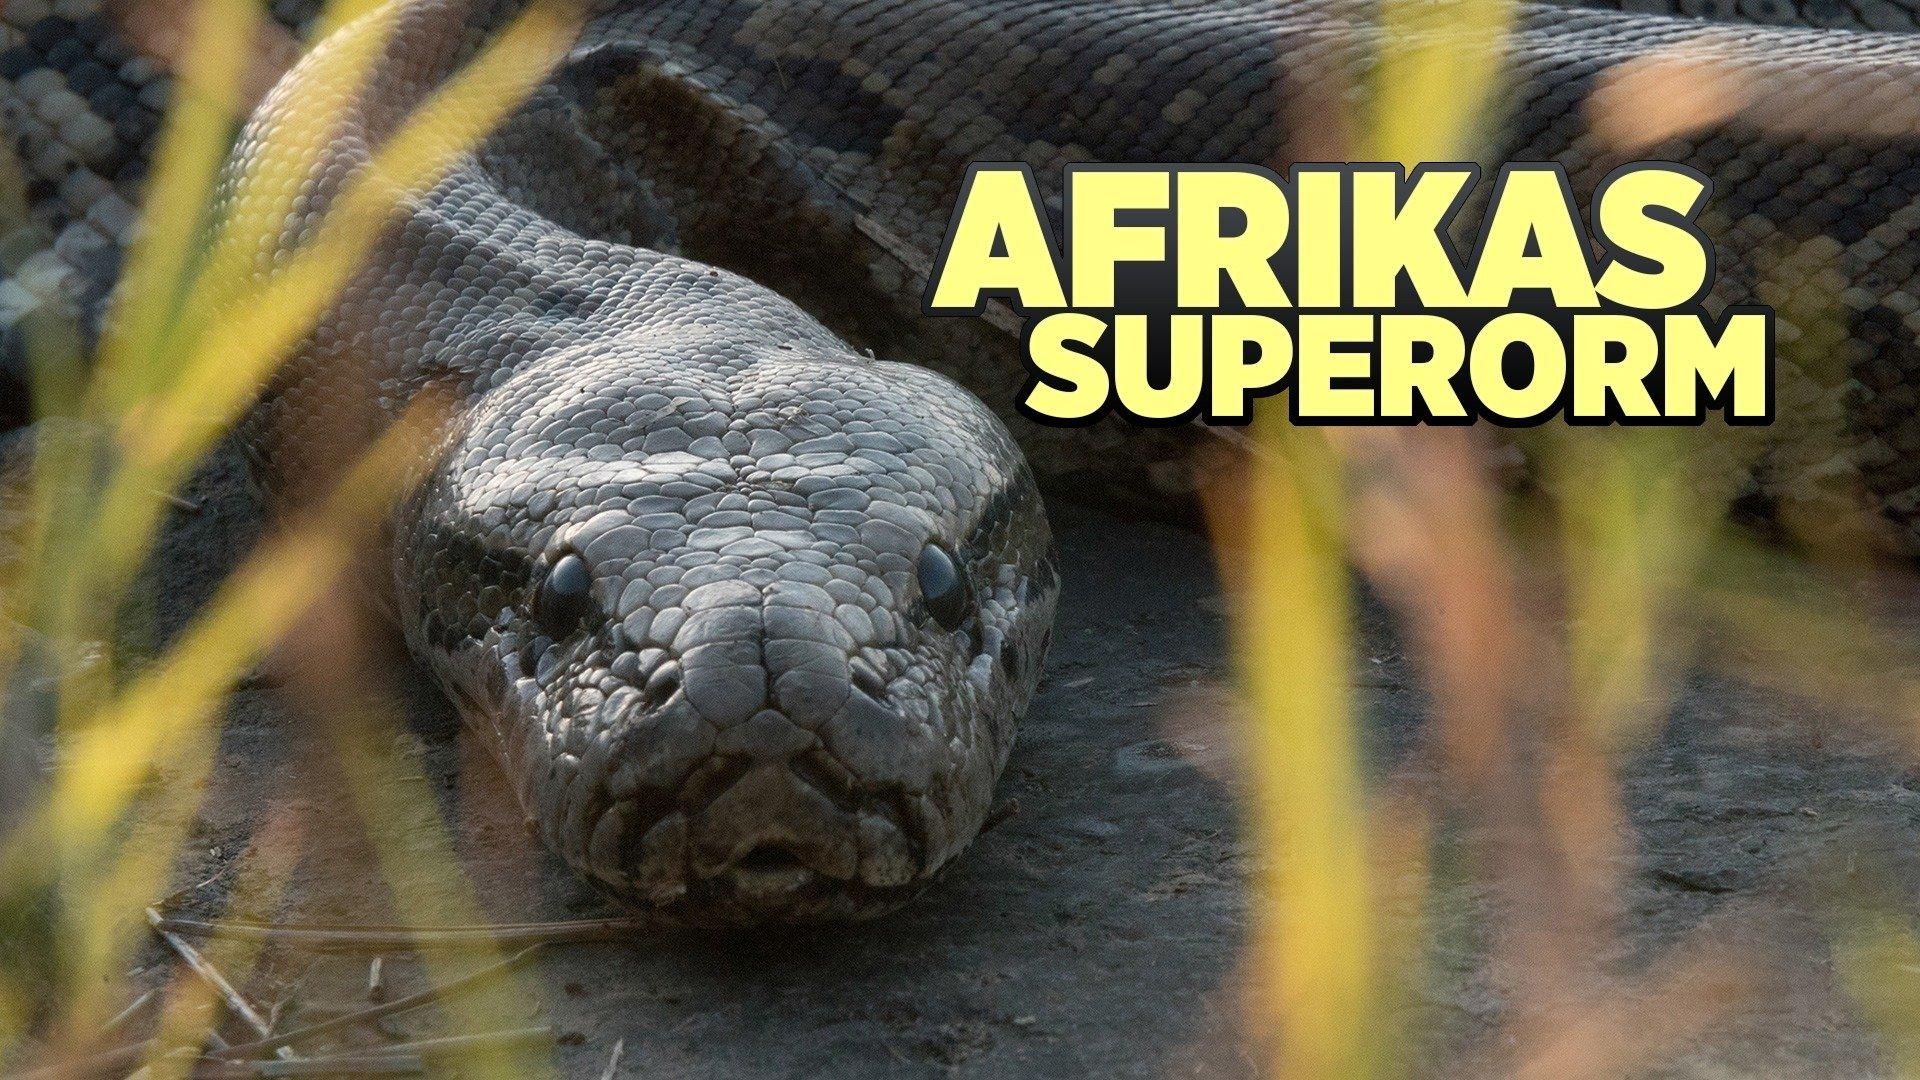 Afrikas superorm